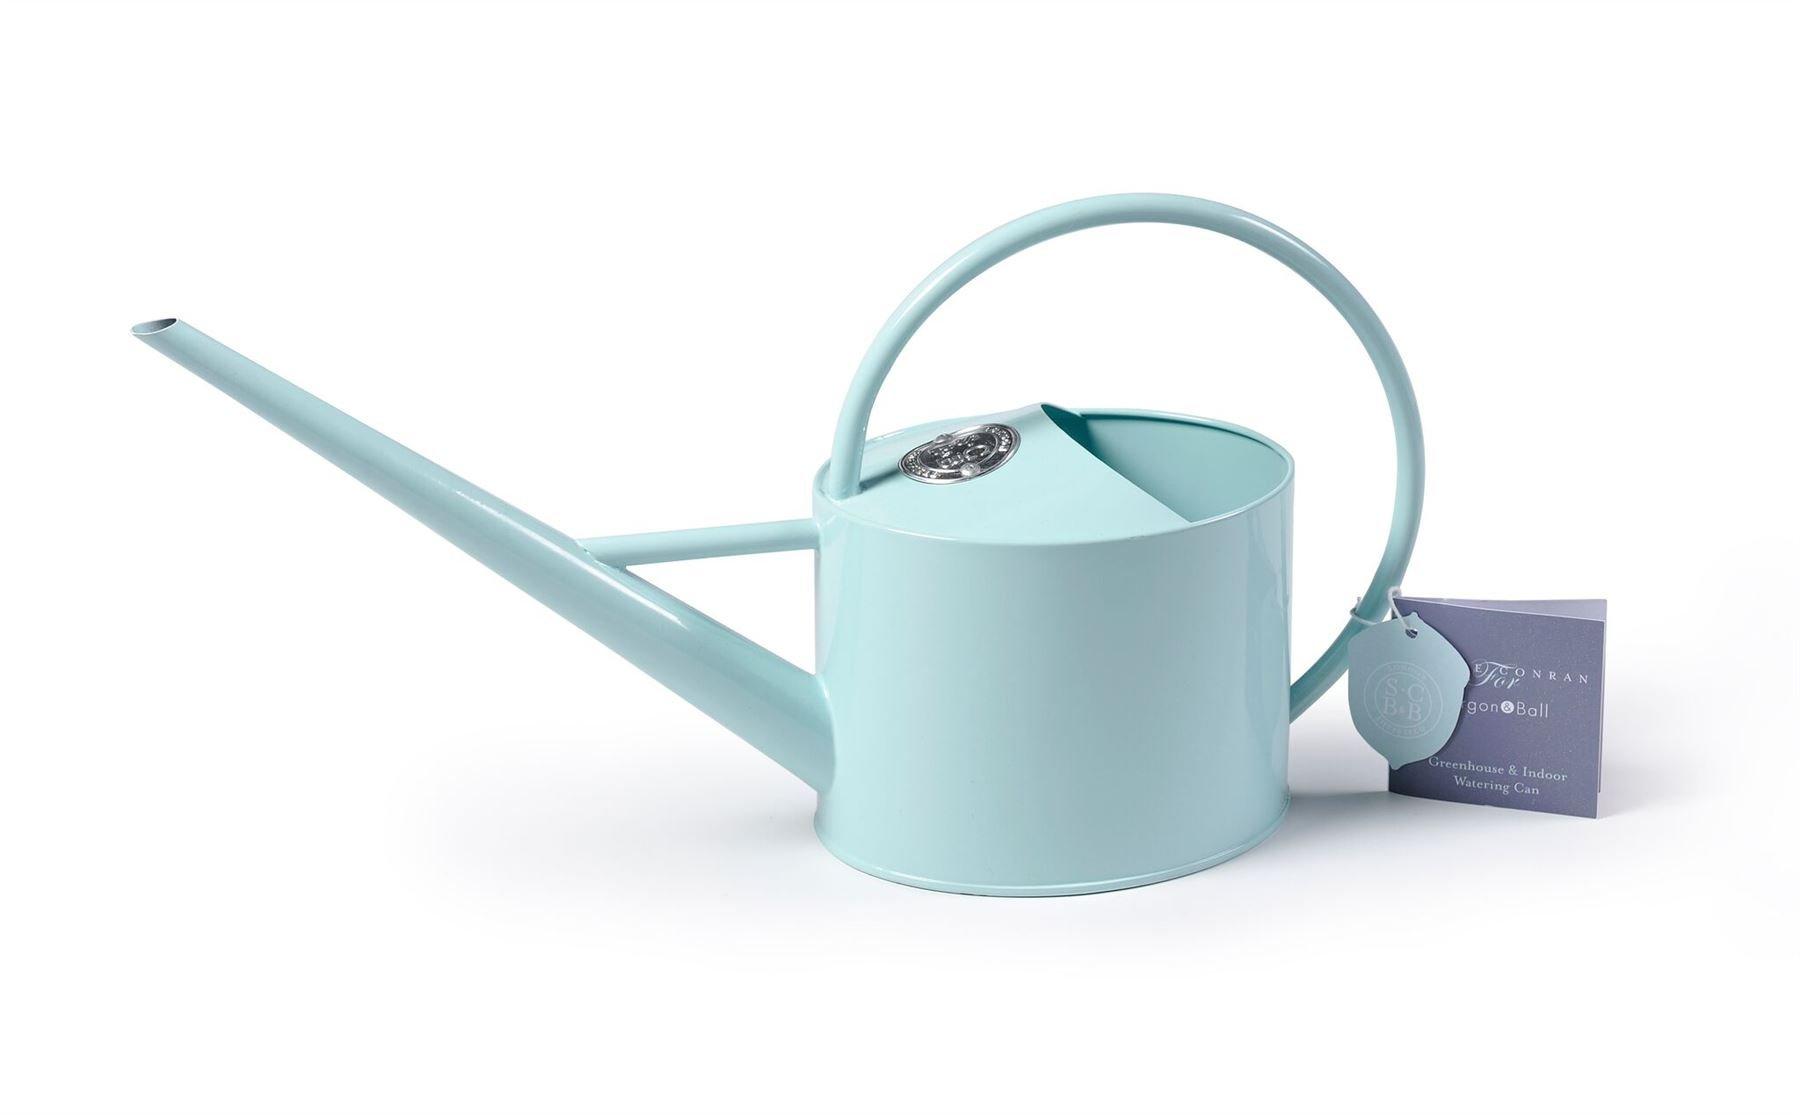 Burgon & Ball Coated Galvanised Steel Long Reach Indoor Watering Can in Pale Blue